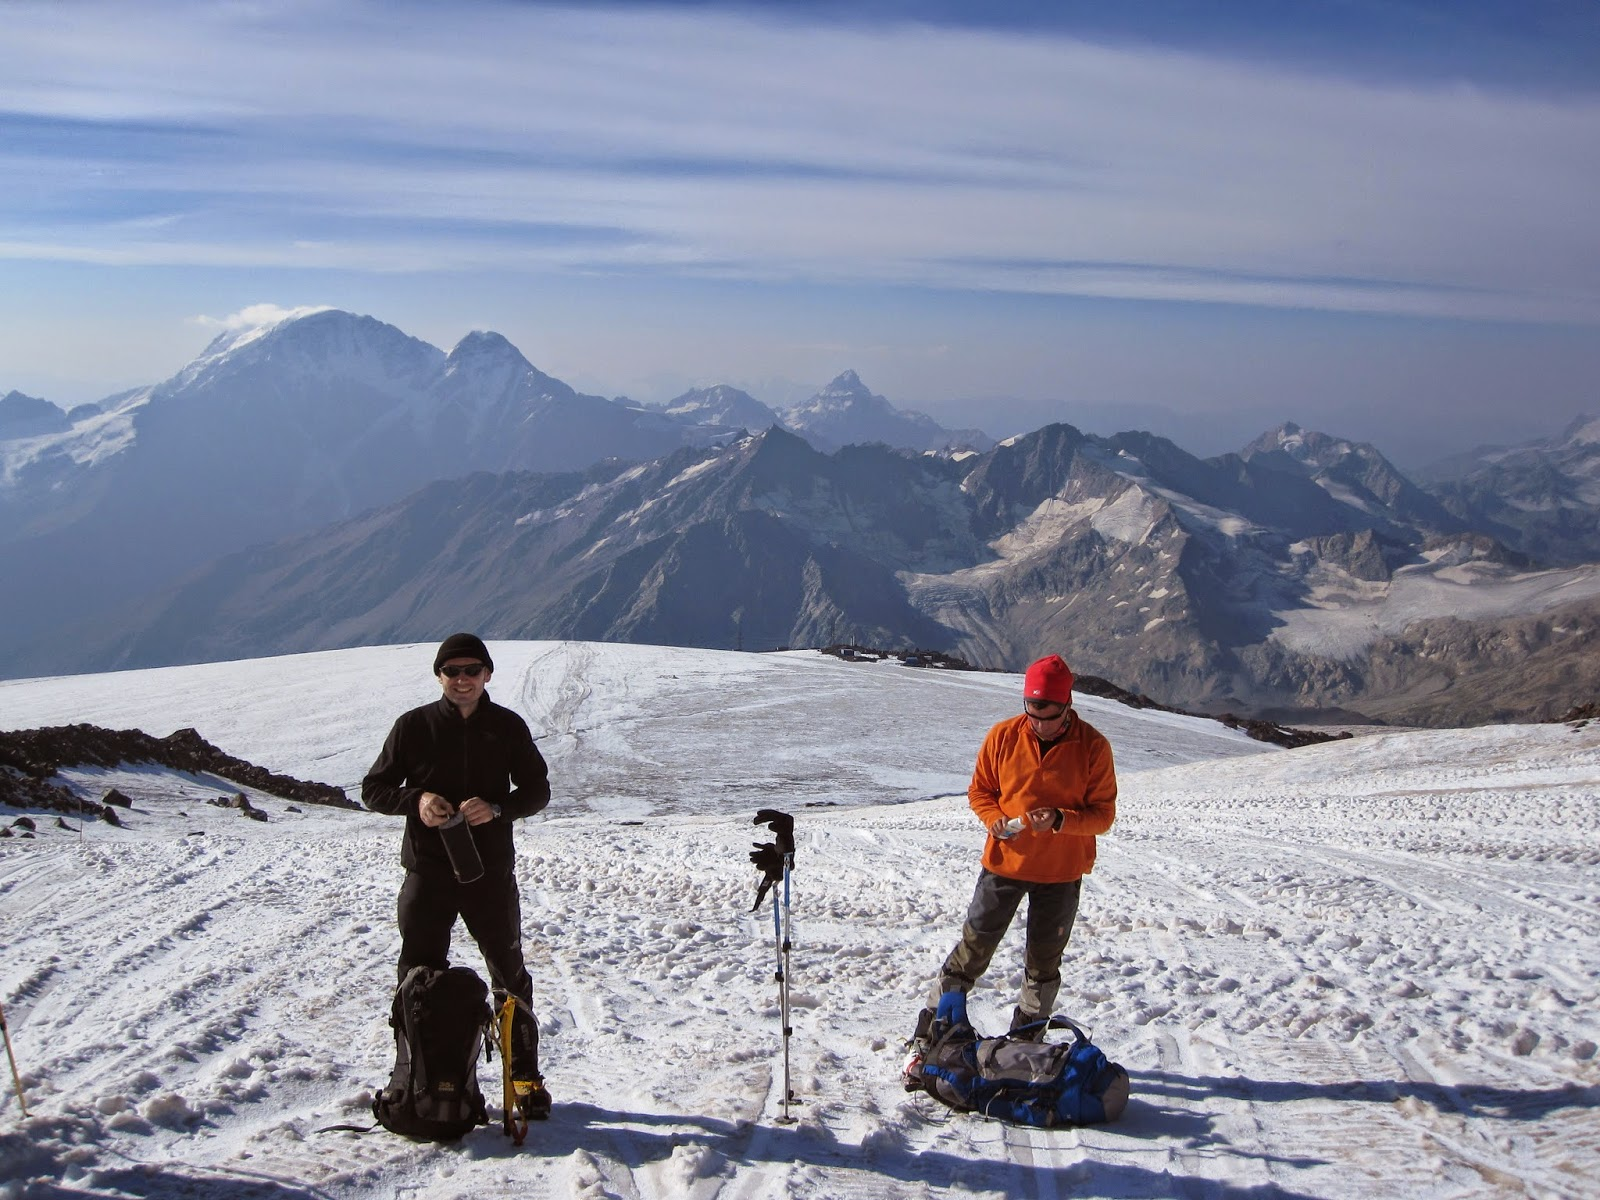 Taking a break on our acclimatization hike up Mount Elbrus.